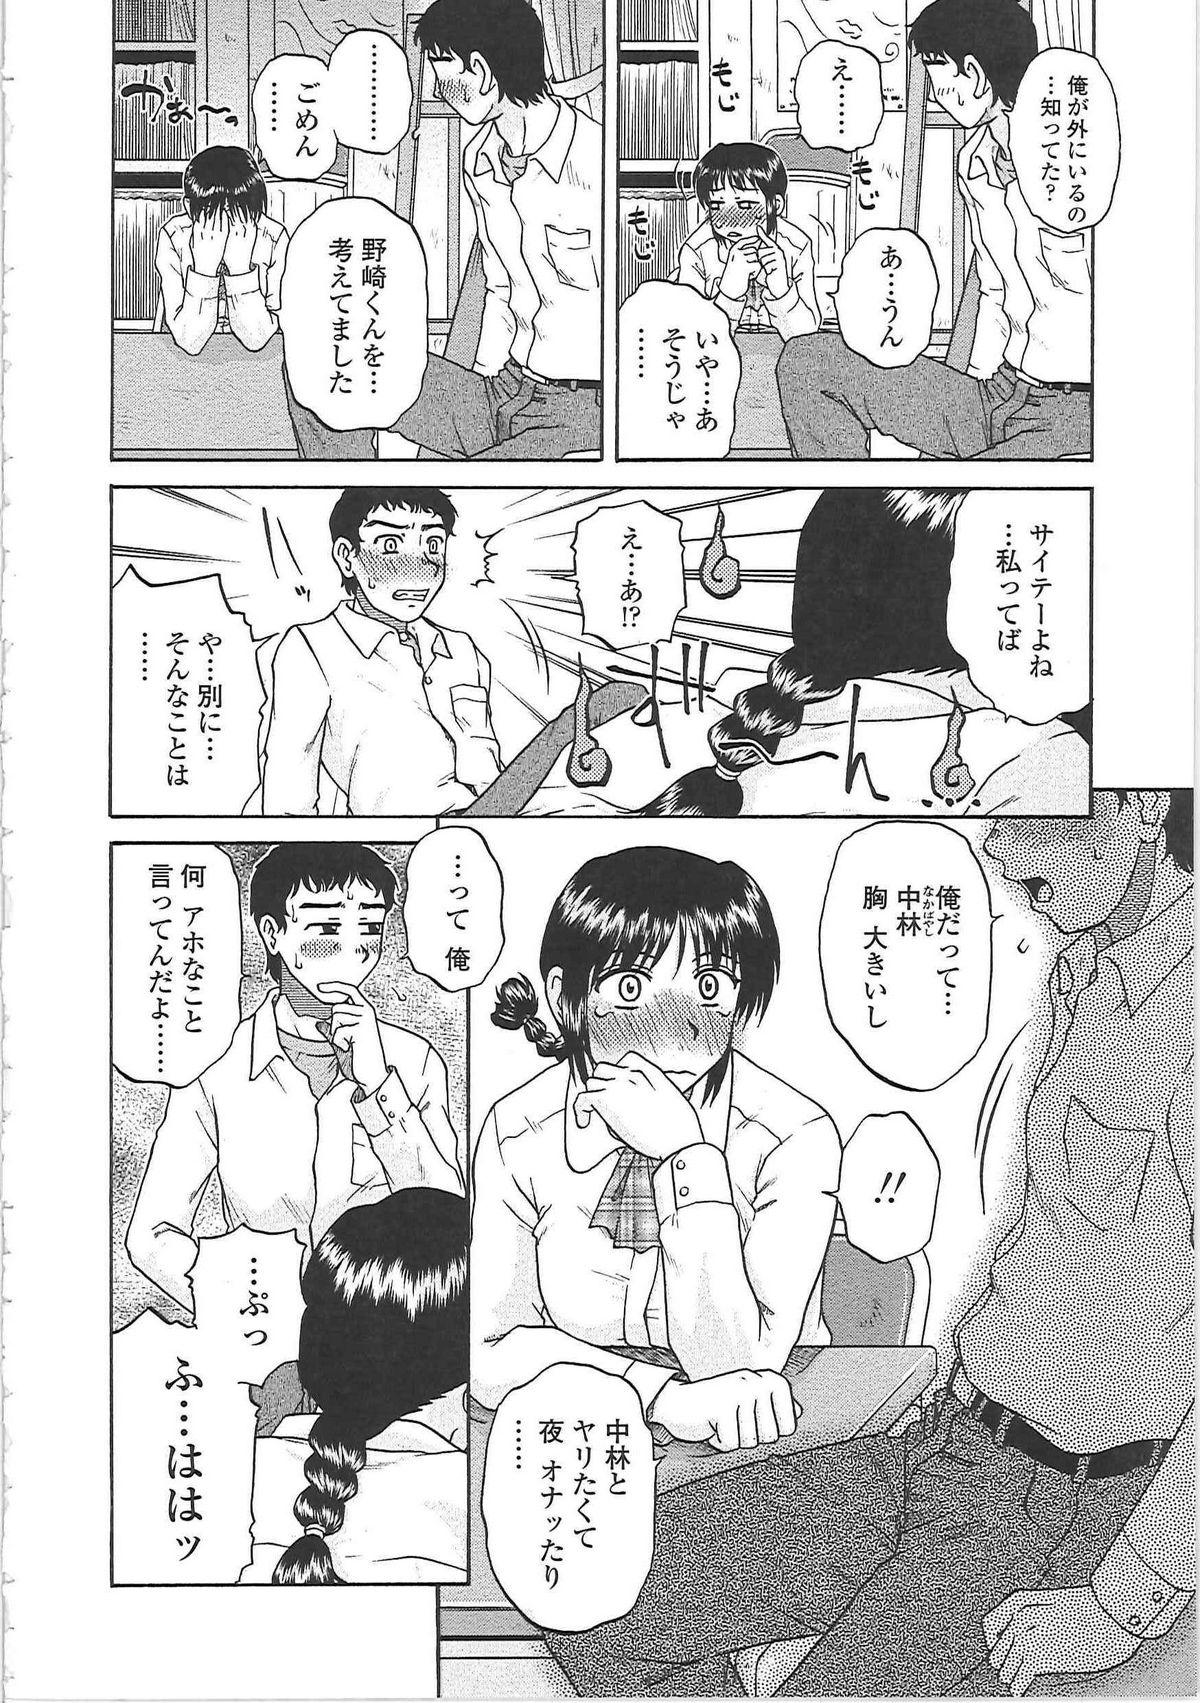 Nikuzuma Tsuushin - Erotic Wife Communication 66